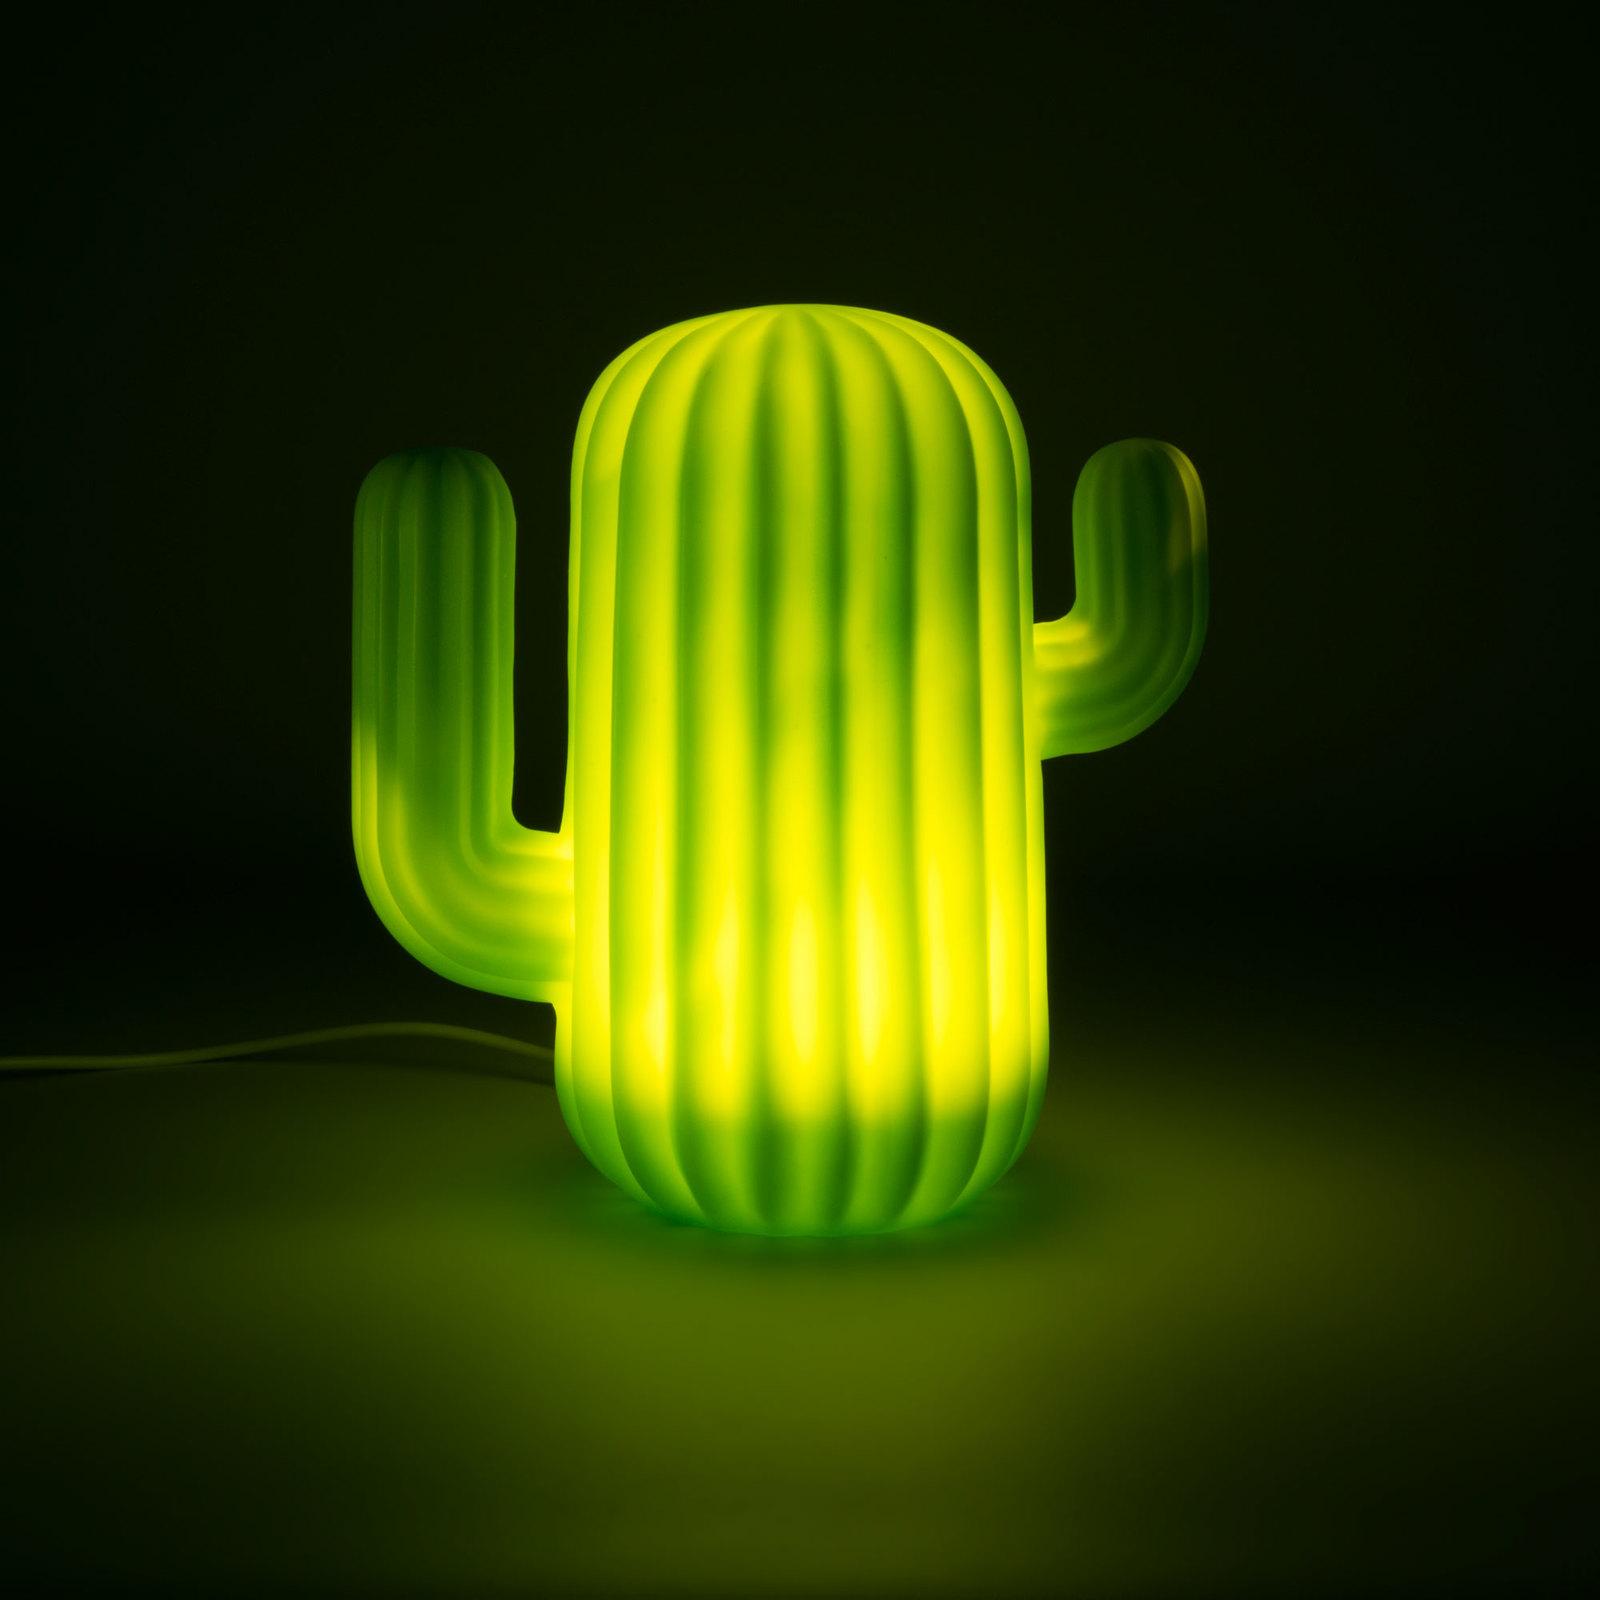 Mustard: LED Light - Cactus image